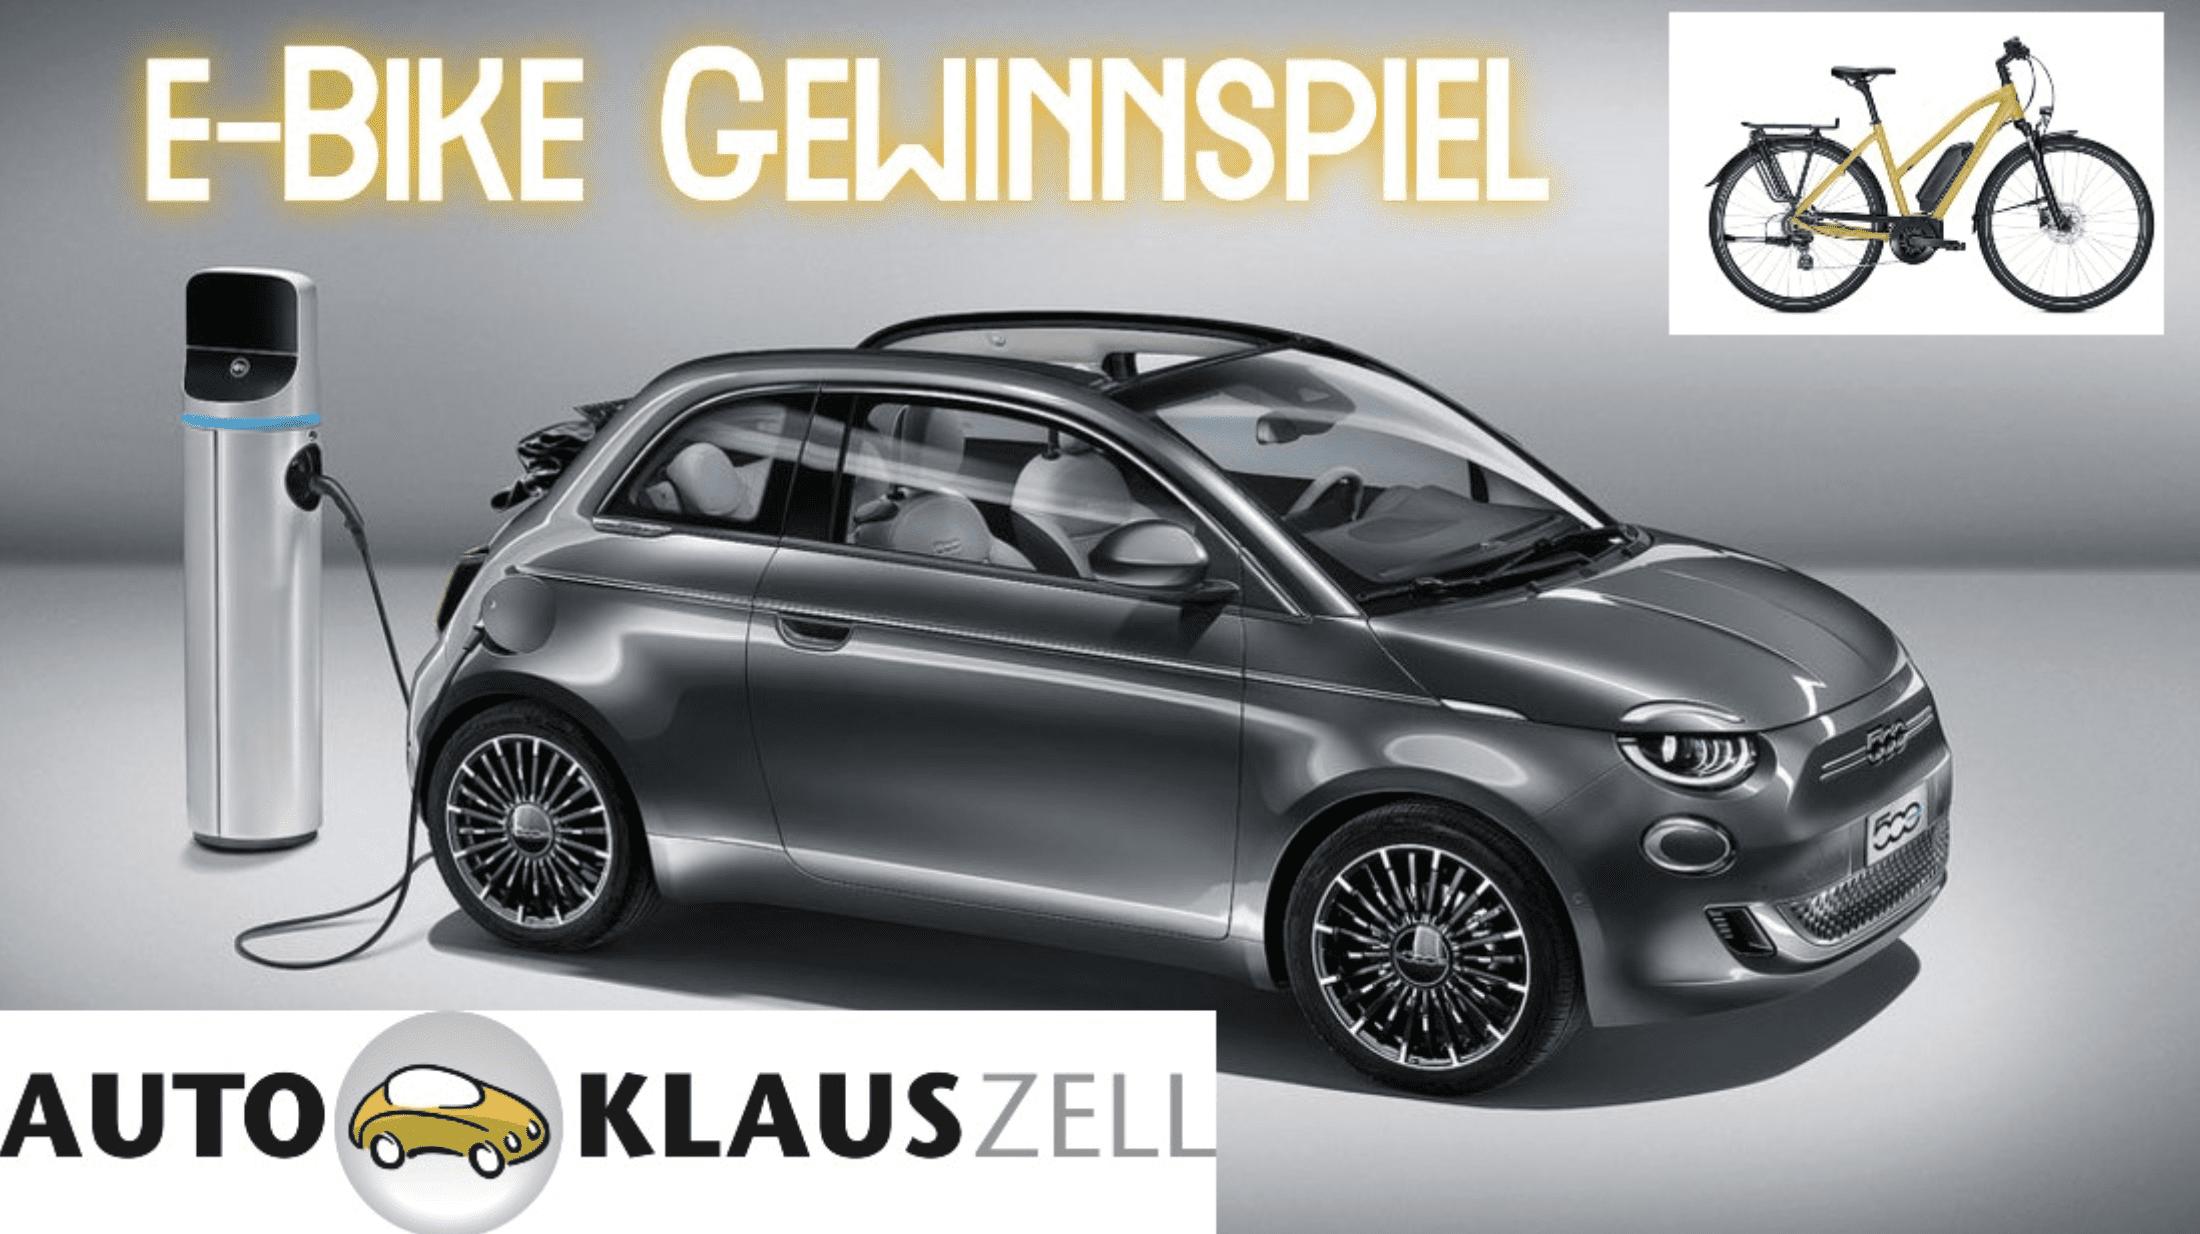 Gewinnspiel-Cases Automotive Auto Klaus